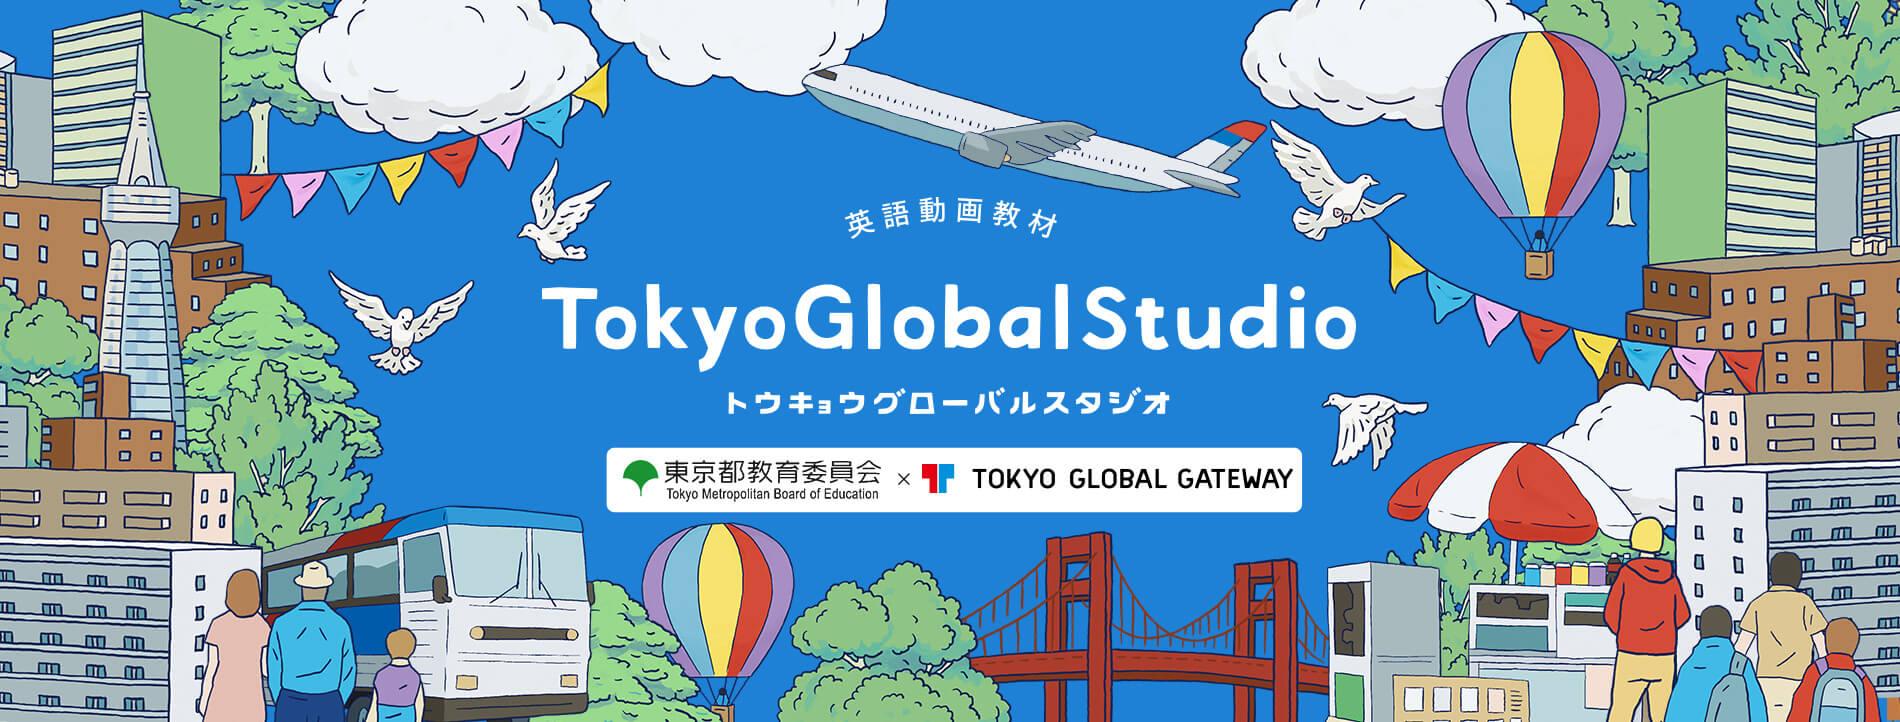 TokyoGlobalStudio(トウキョウグローバルスタジオ)